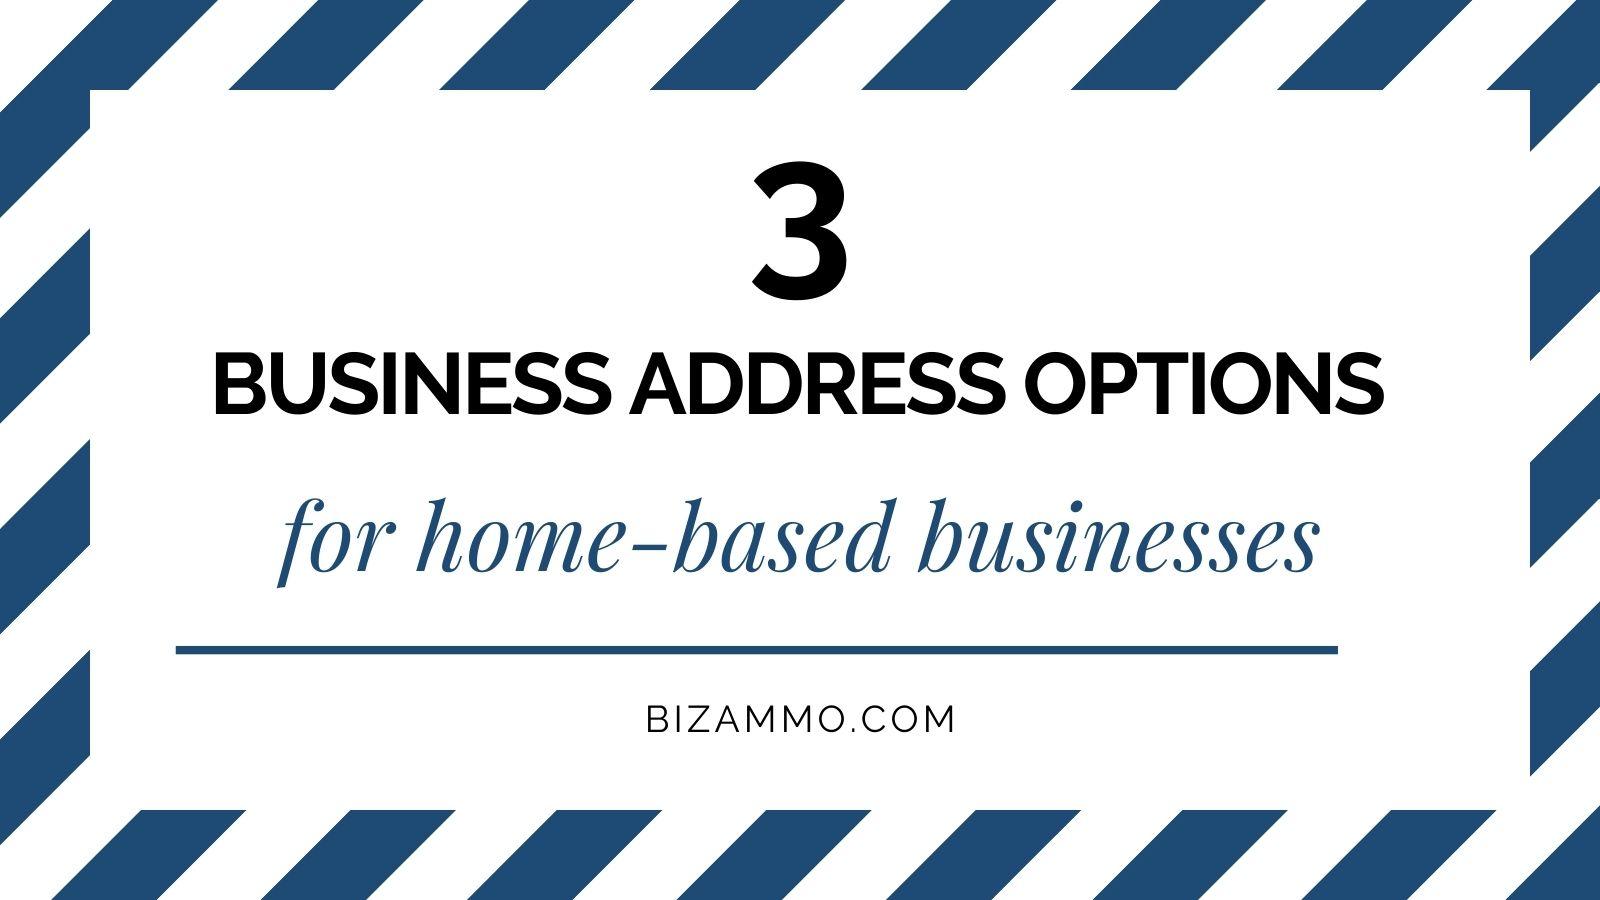 3 Business Address Options for Home-Based Businesses - BIZAMMO.COM